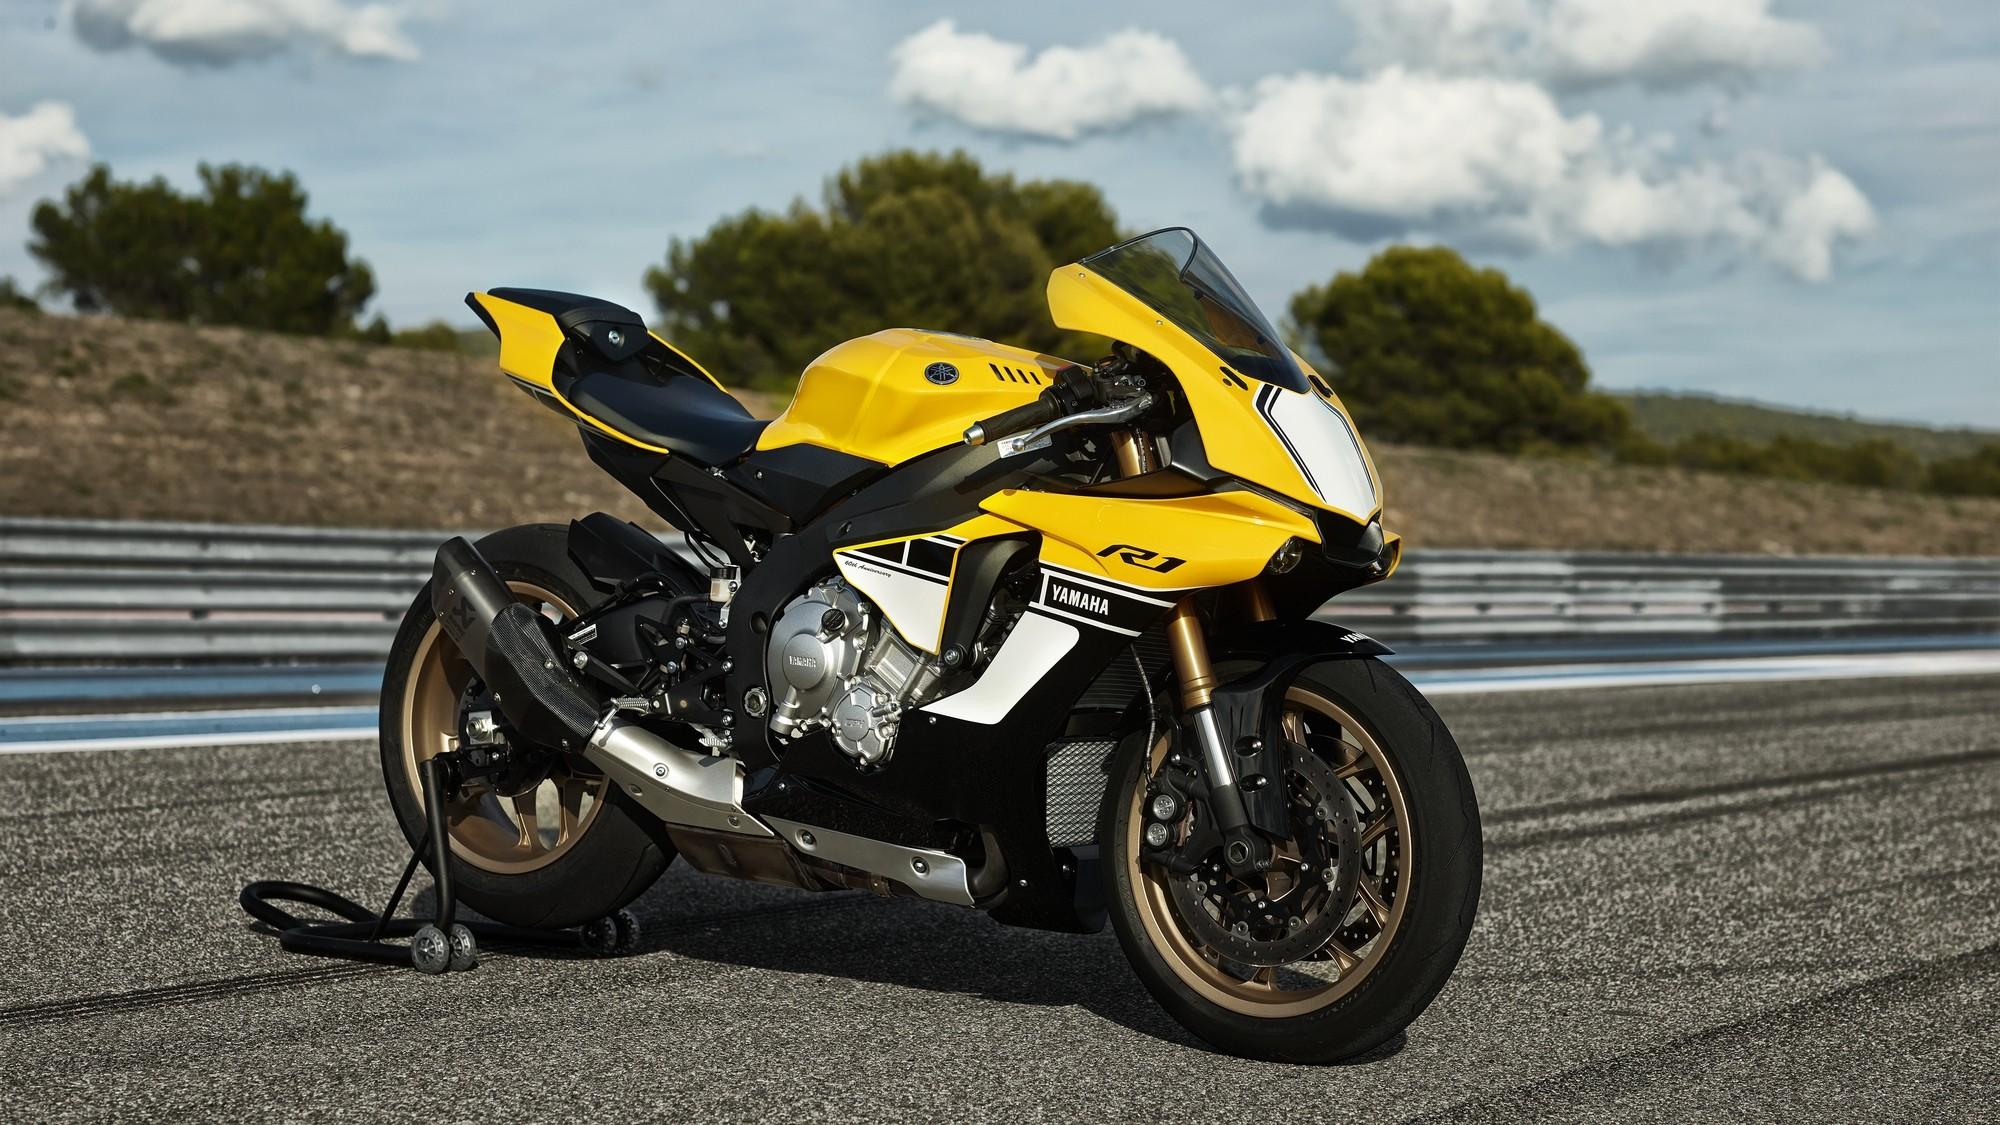 Yamaha R1 Anniversary Edition 2